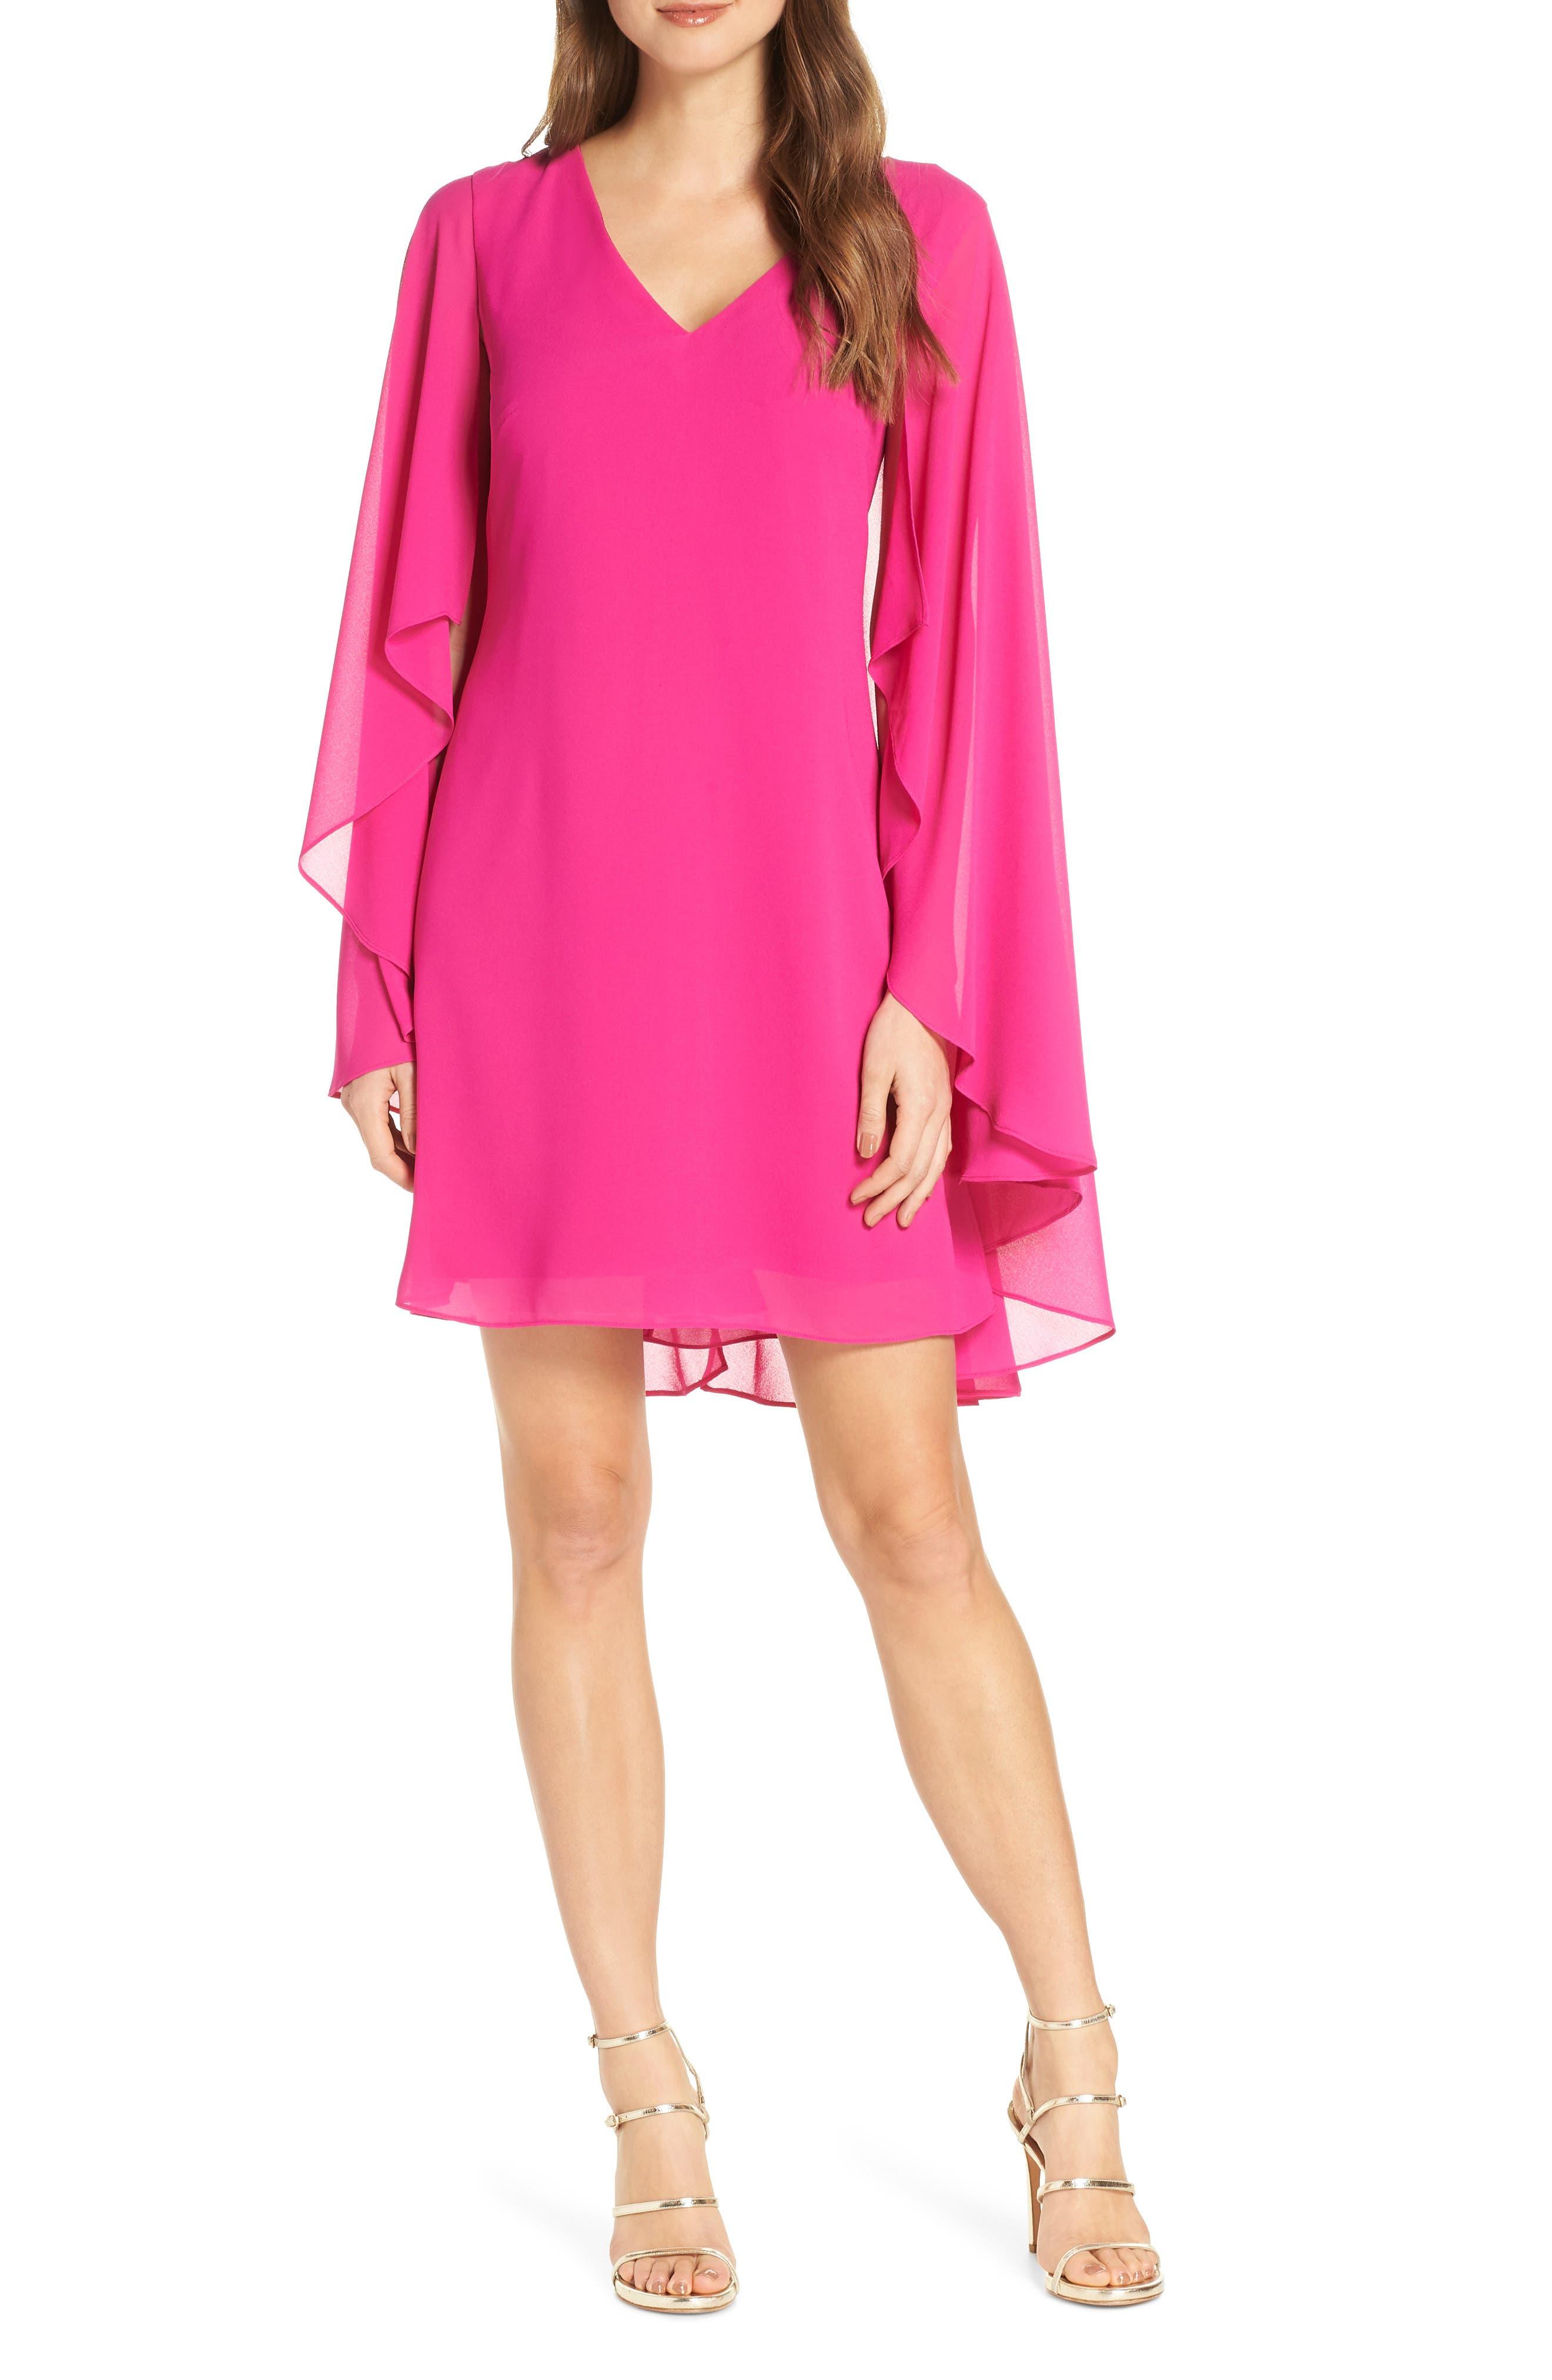 Petite Vince Camuto Cape Back Shift Dress, Pink